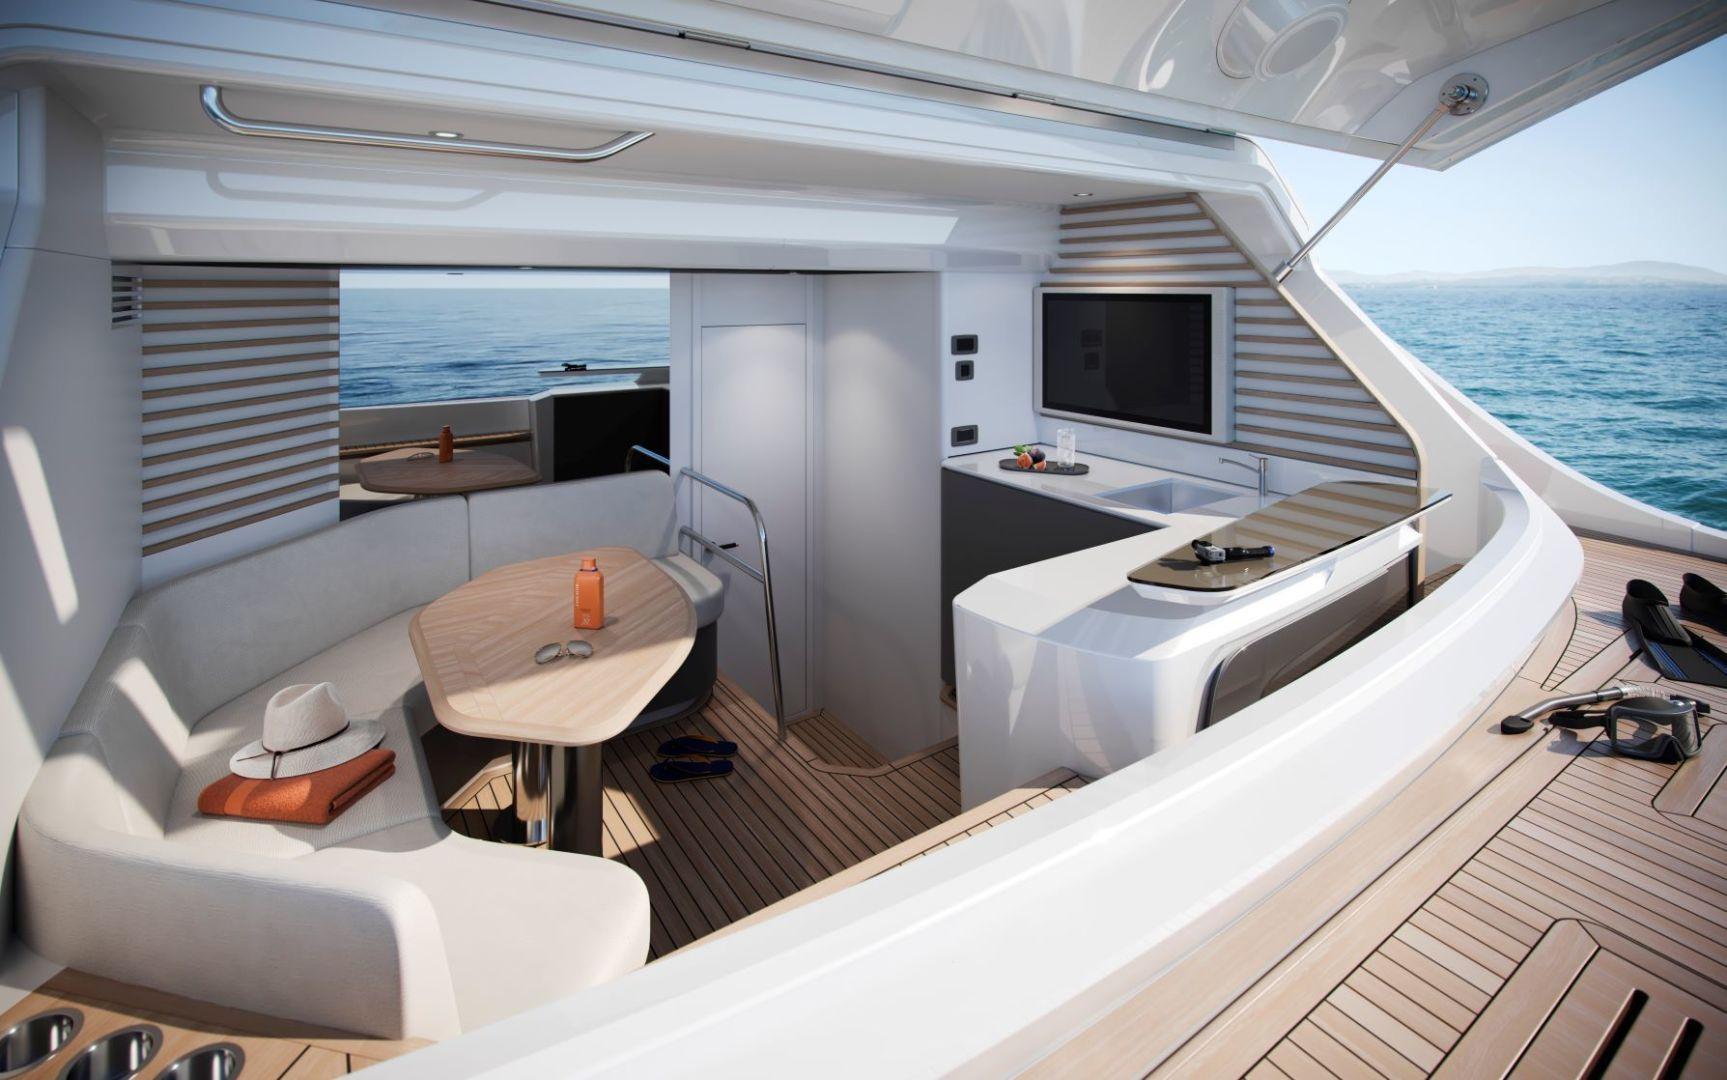 Princess-95 Motor Yacht 2022-Y95 Unknown-Florida-United States-1582772 | Thumbnail